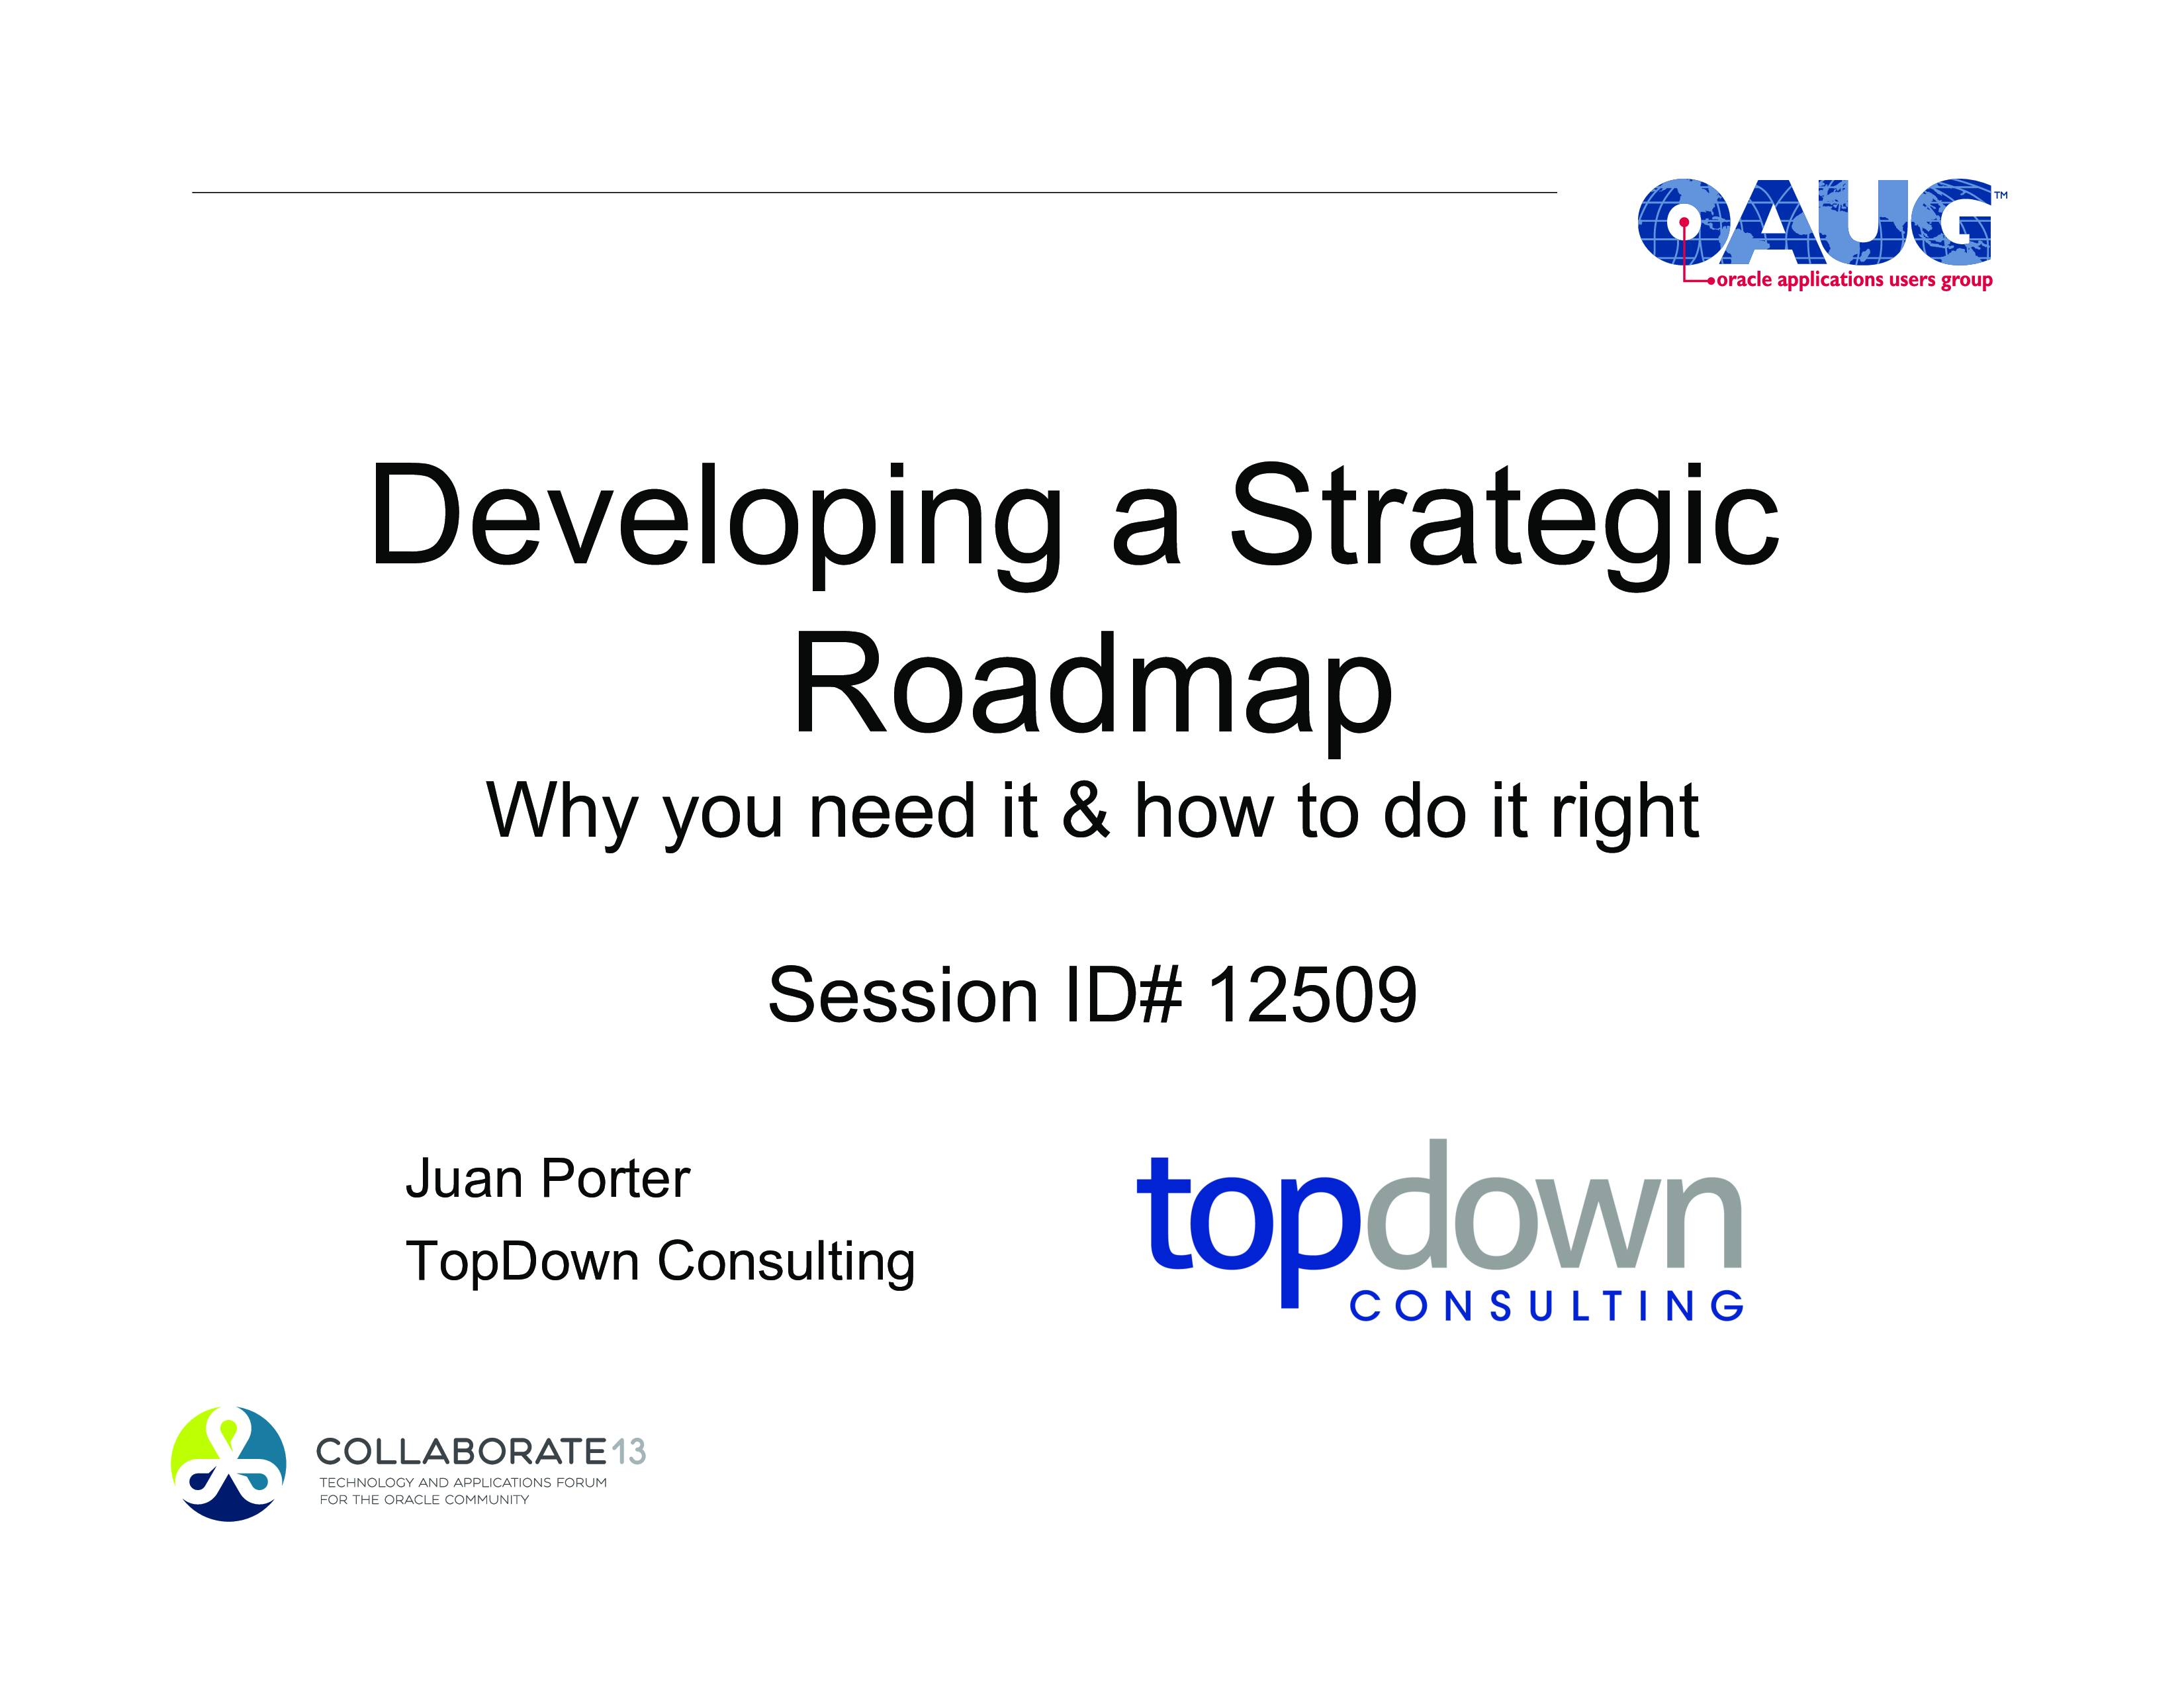 Strategic Roadmap Templates